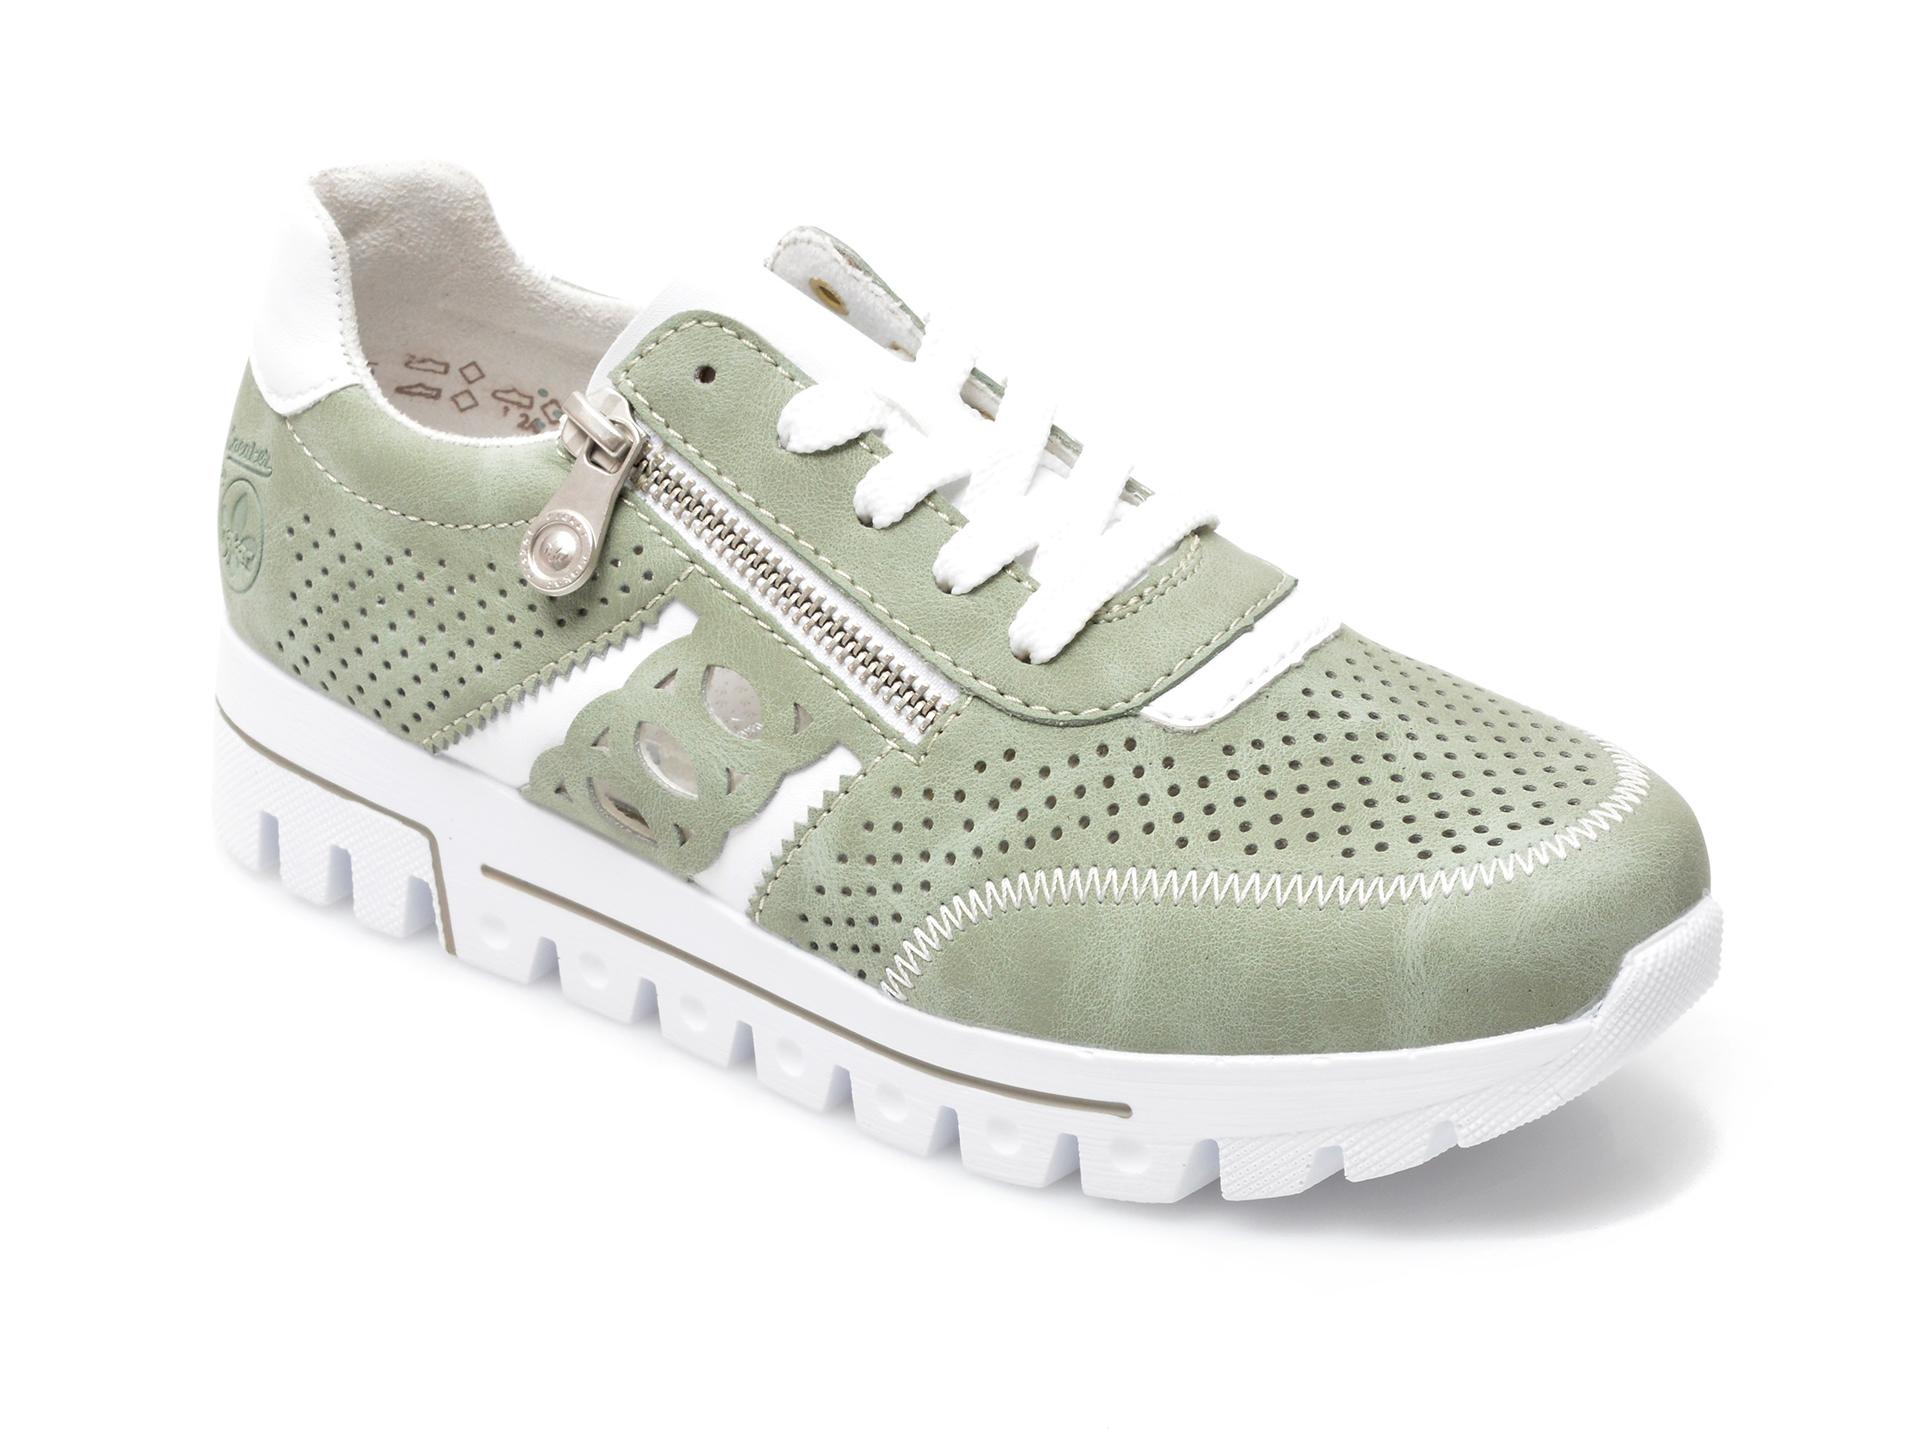 Pantofi sport RIEKER verzi, L2807, din piele ecologica imagine otter.ro 2021